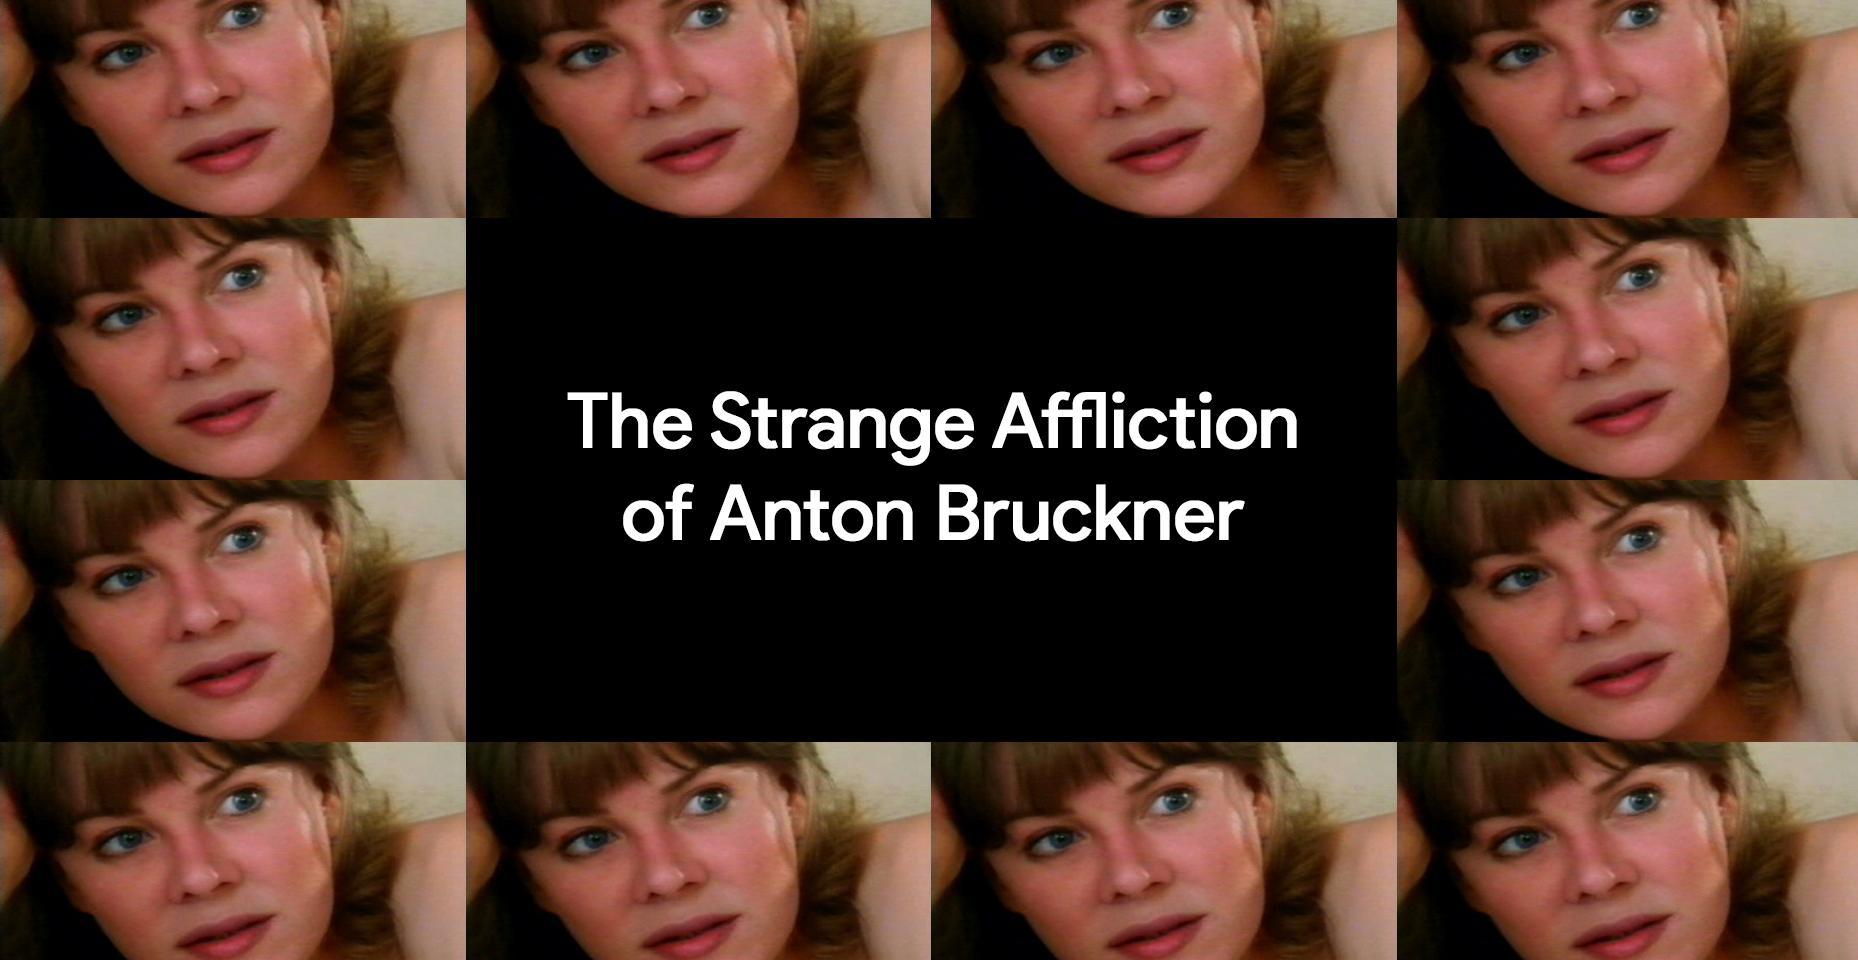 The Strange Affliction of Anton Bruckner